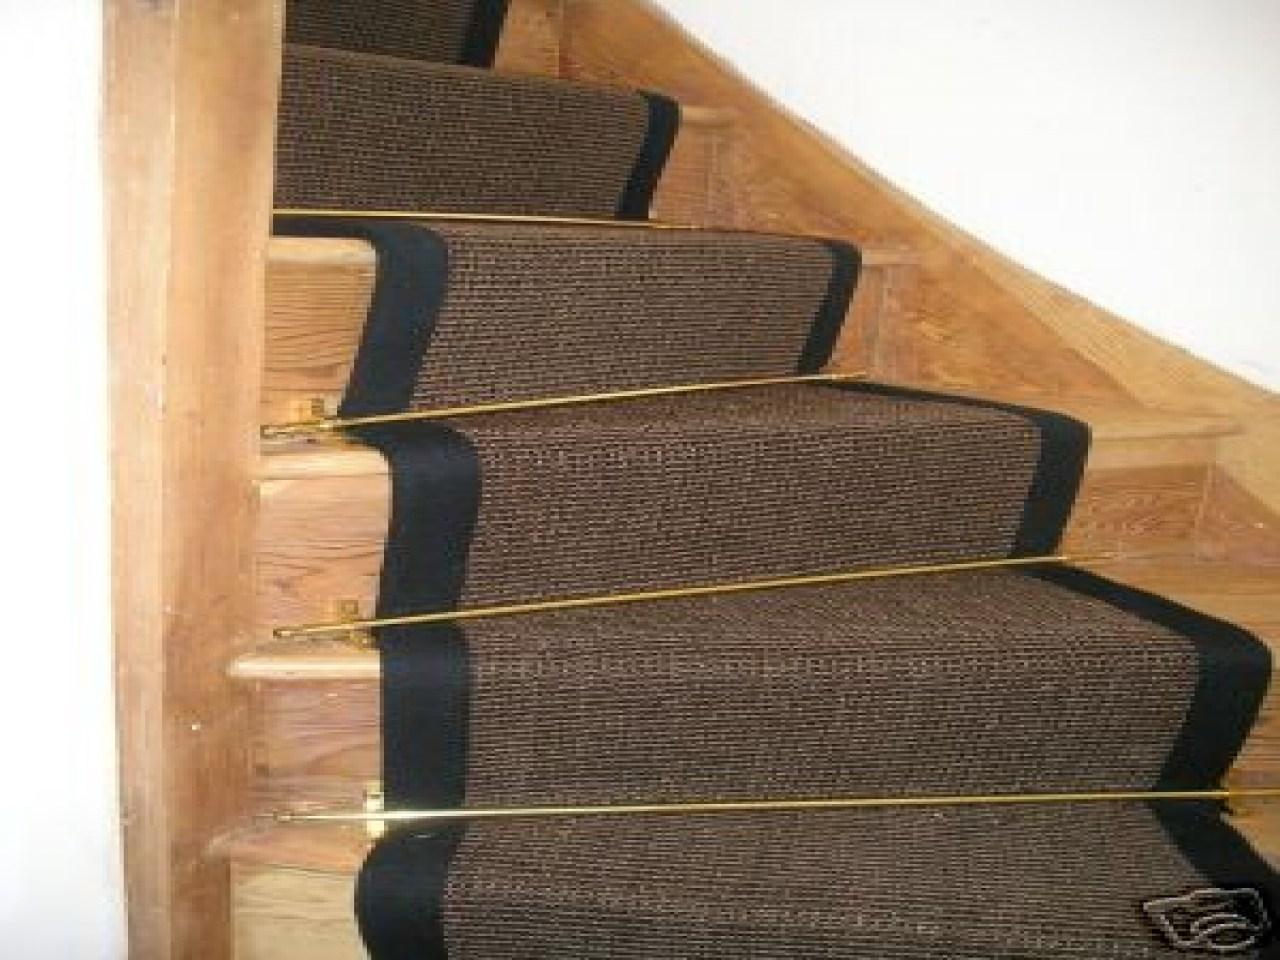 Carpet Runner For Stairs Home Depot Hawk Haven   Home Depot Carpet Runners For Stairs   Natco Kurdamir   Carpet Flooring   Mat   Area Rugs   Reds Pinks